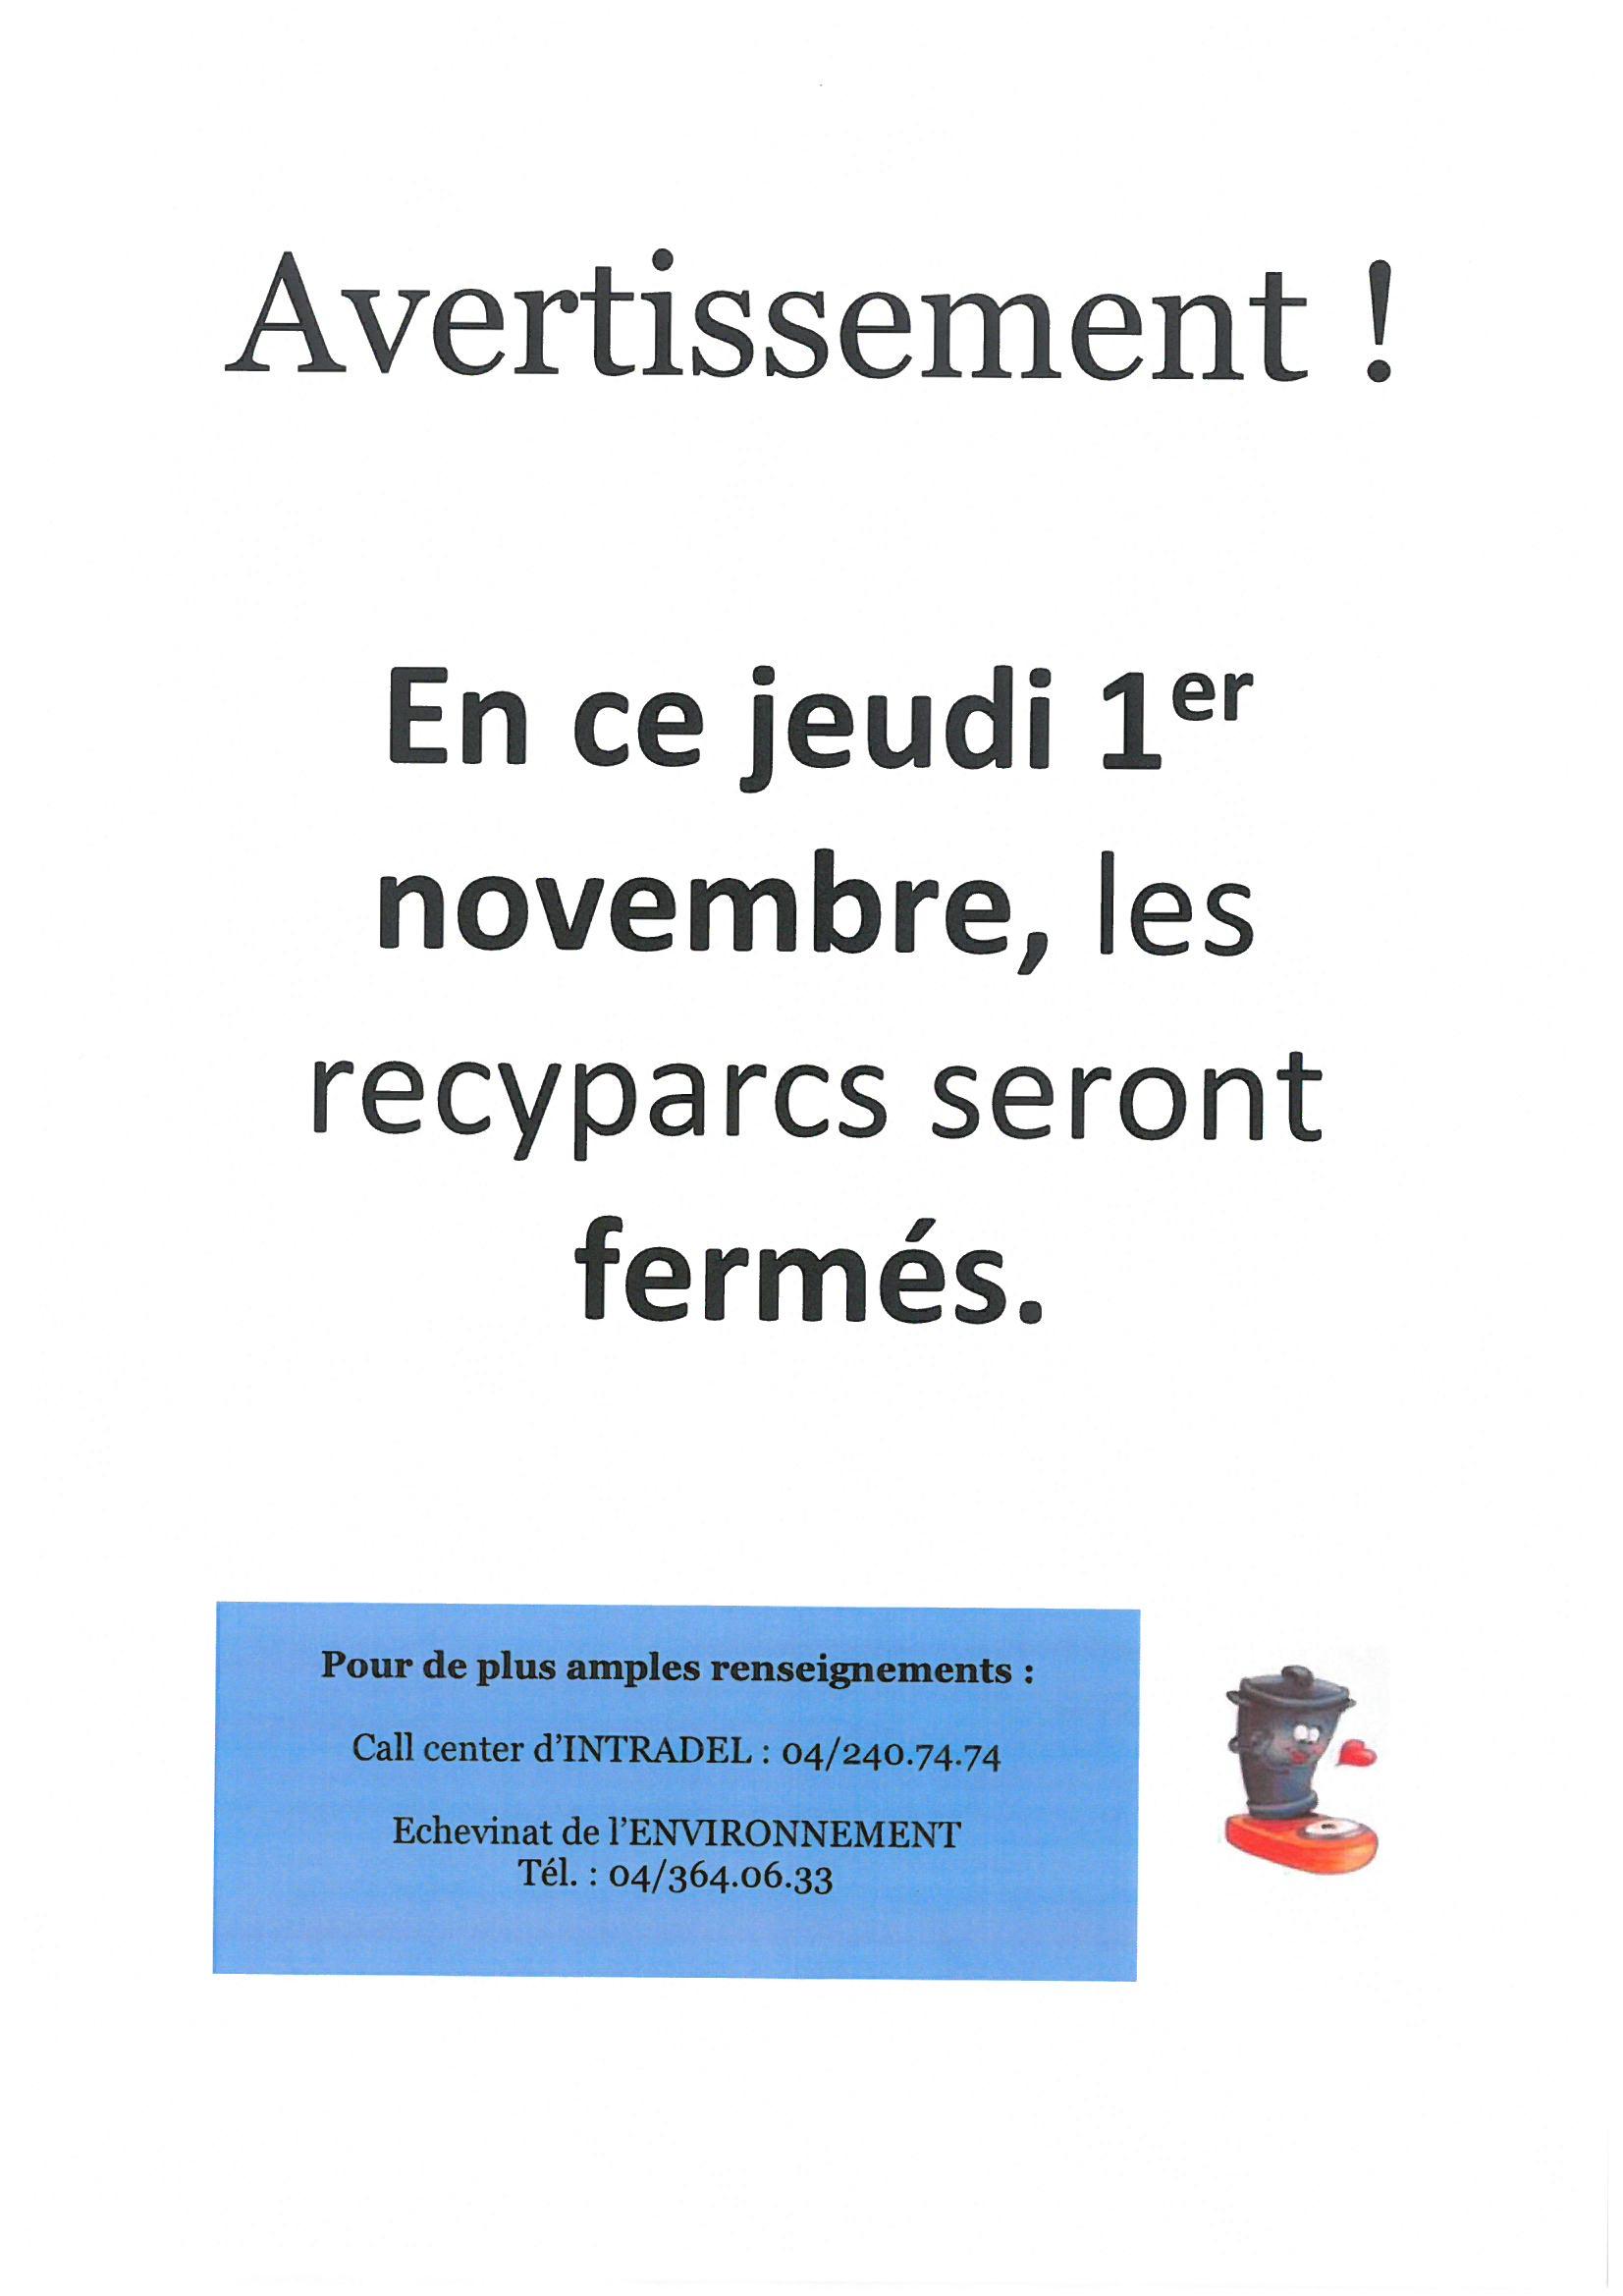 Fermeture des recyparcs ce jeudi 1er novembre